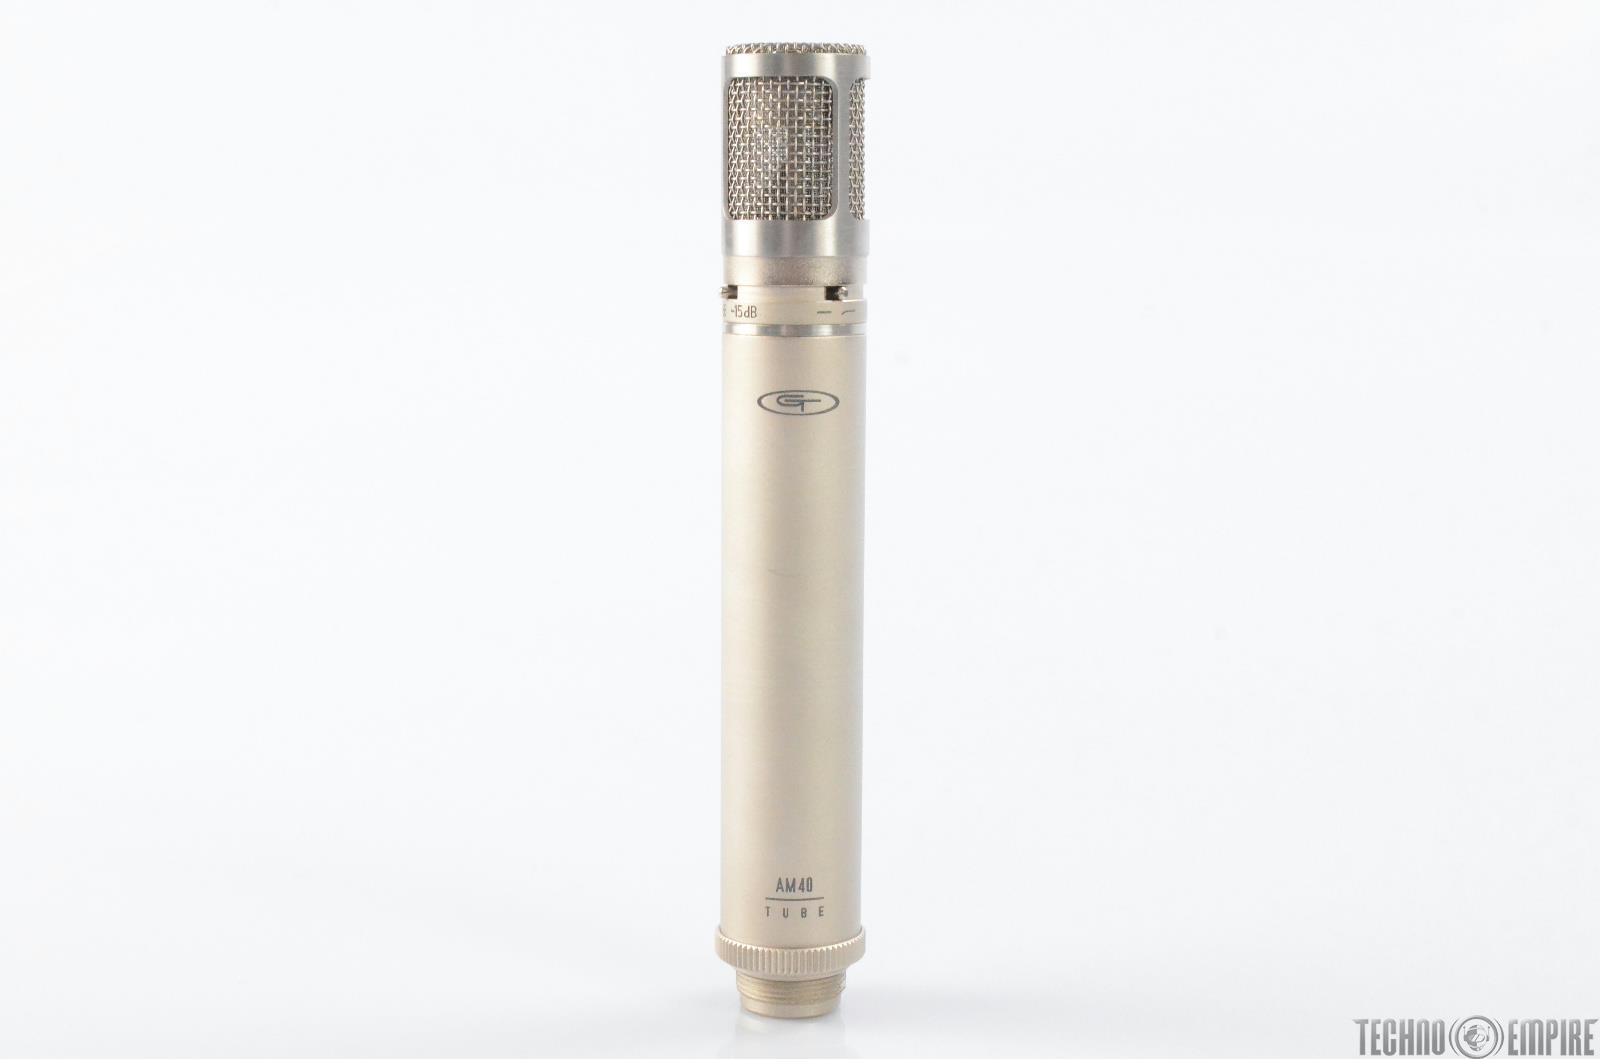 Alesis Groove Tubes GT AM40 Tube Condenser Microphone Studio Mic #28953